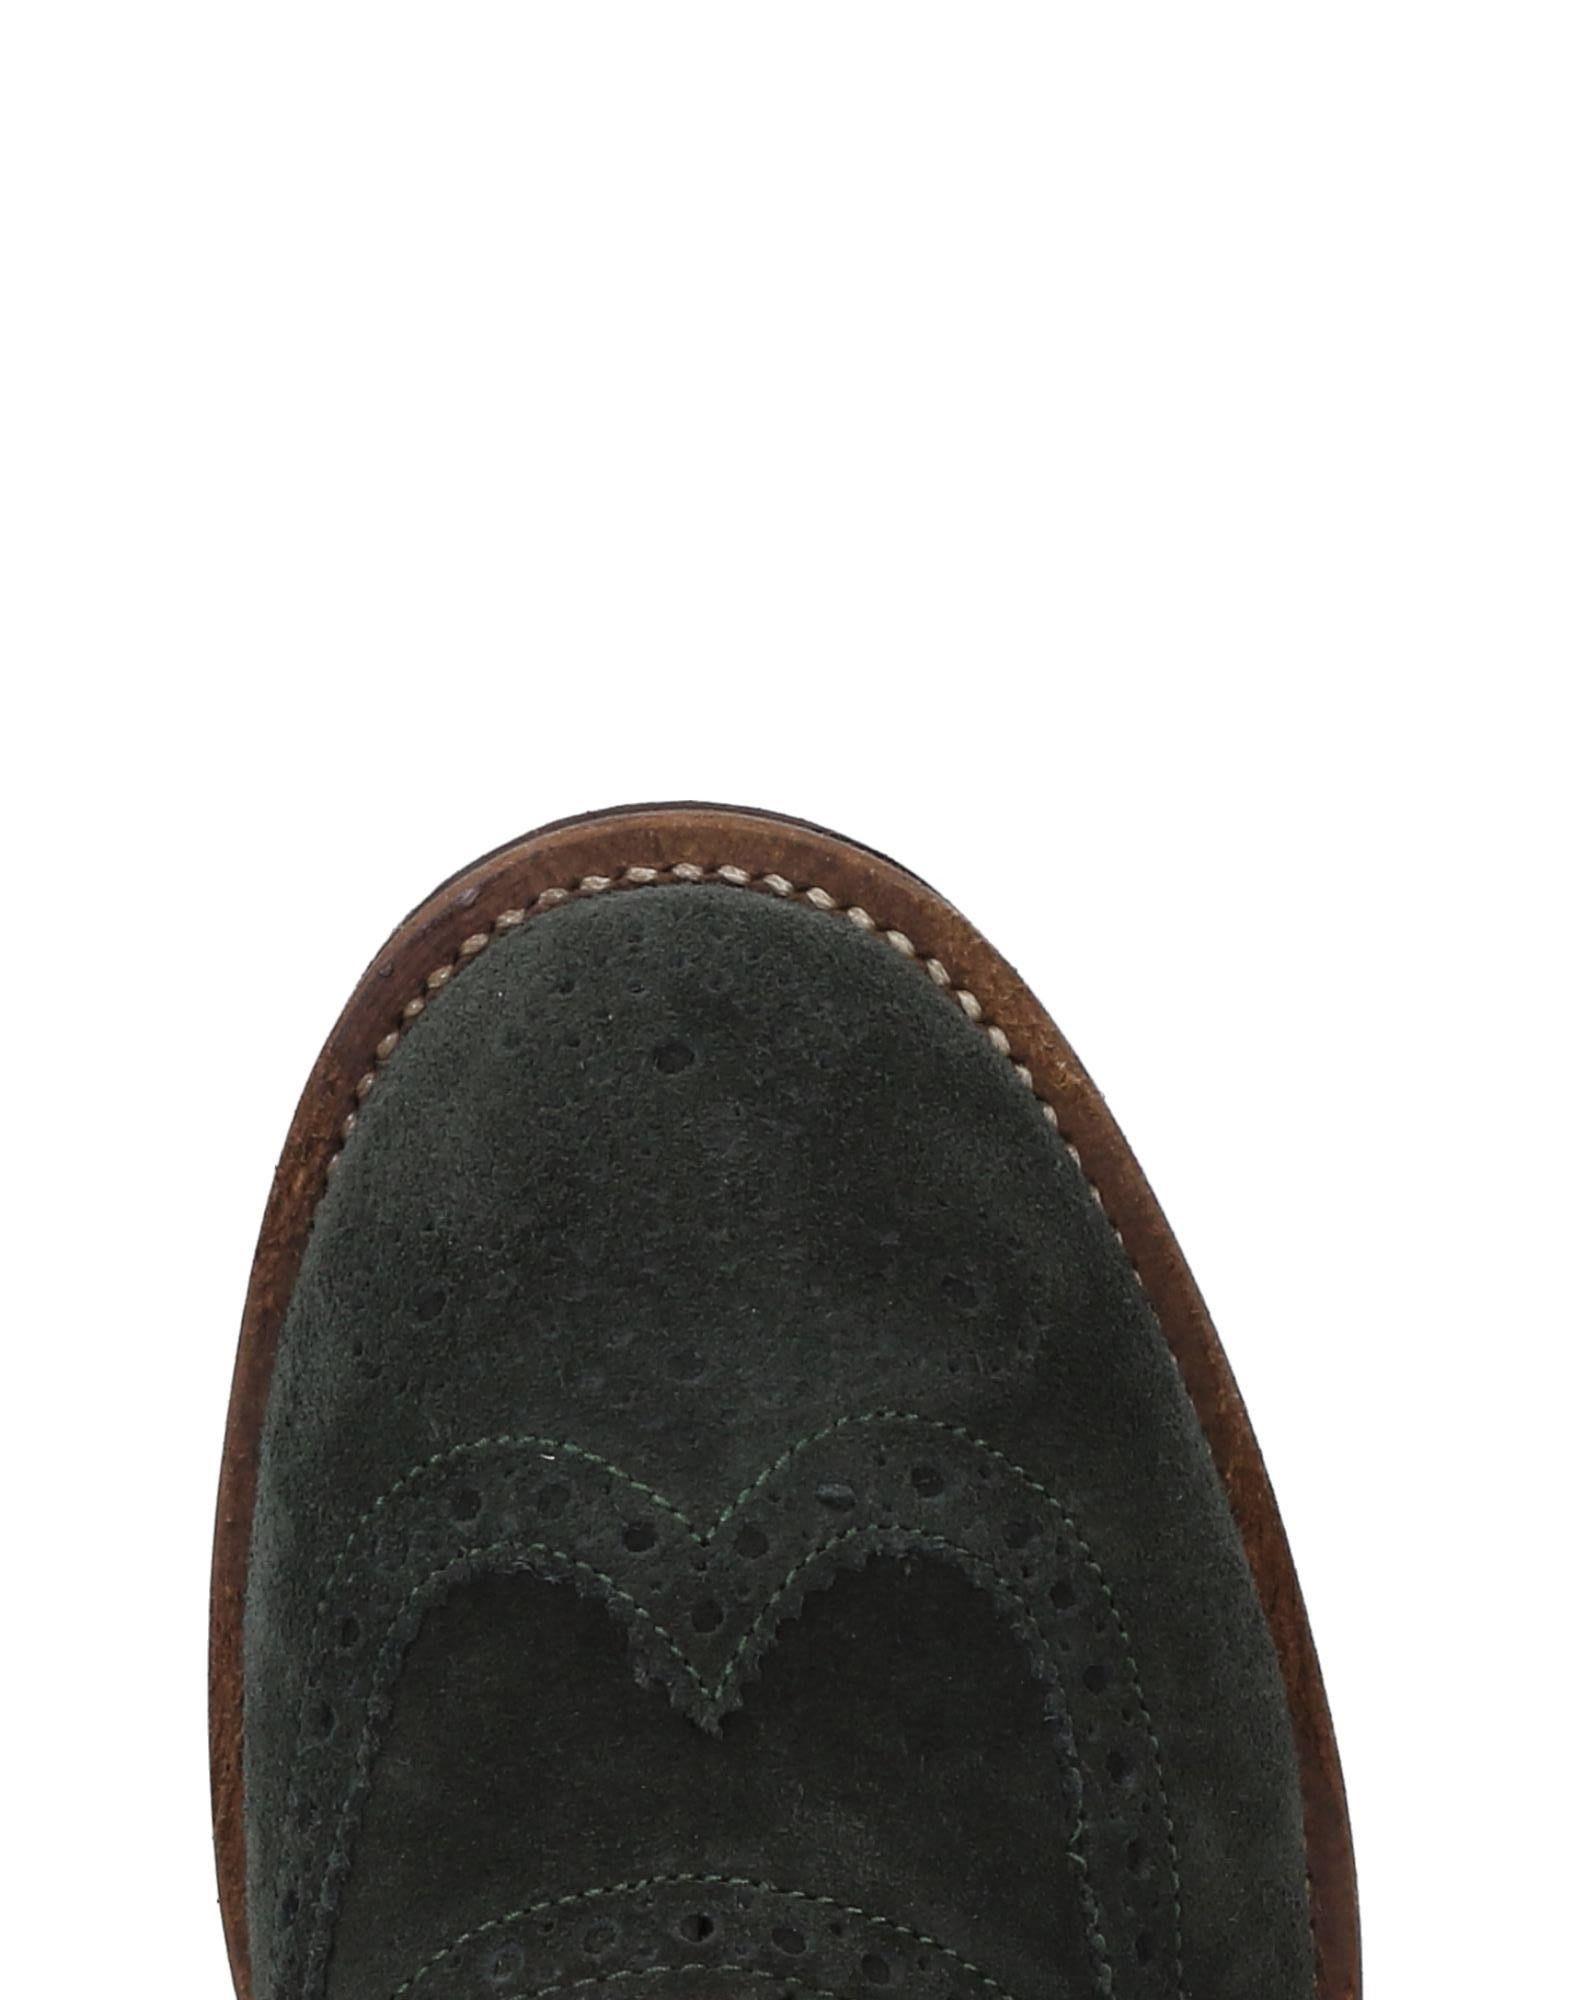 Rabatt echte Schnürschuhe Schuhe Snobs® Schnürschuhe echte Herren  11503751CB f19cd1